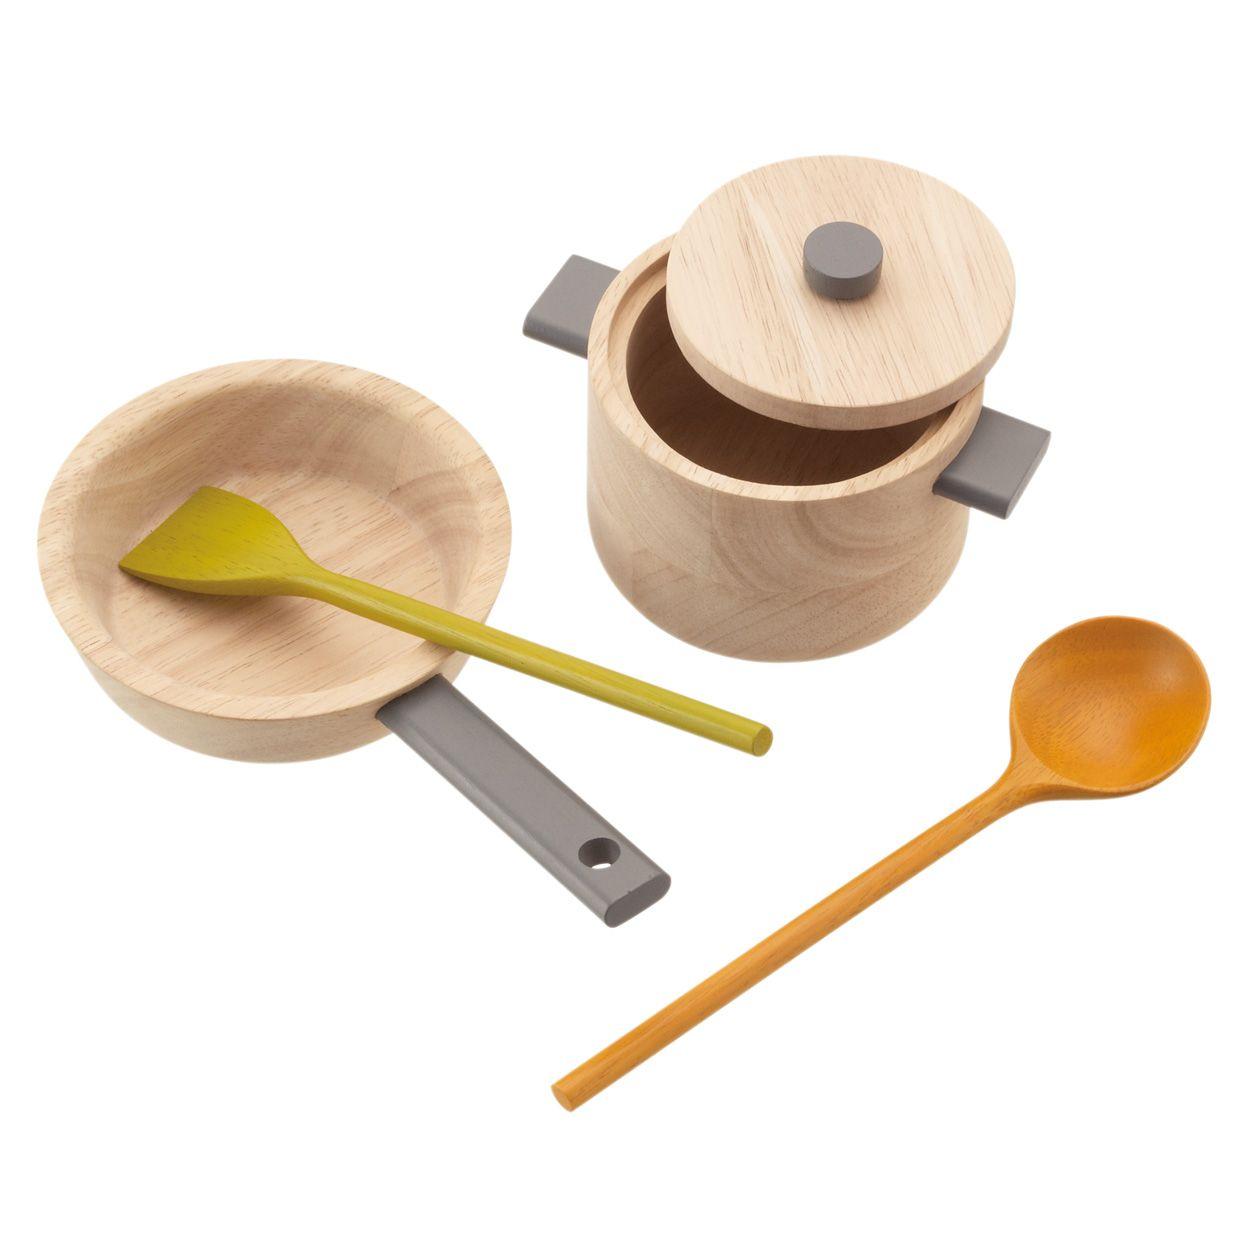 Wooden play pot and pan